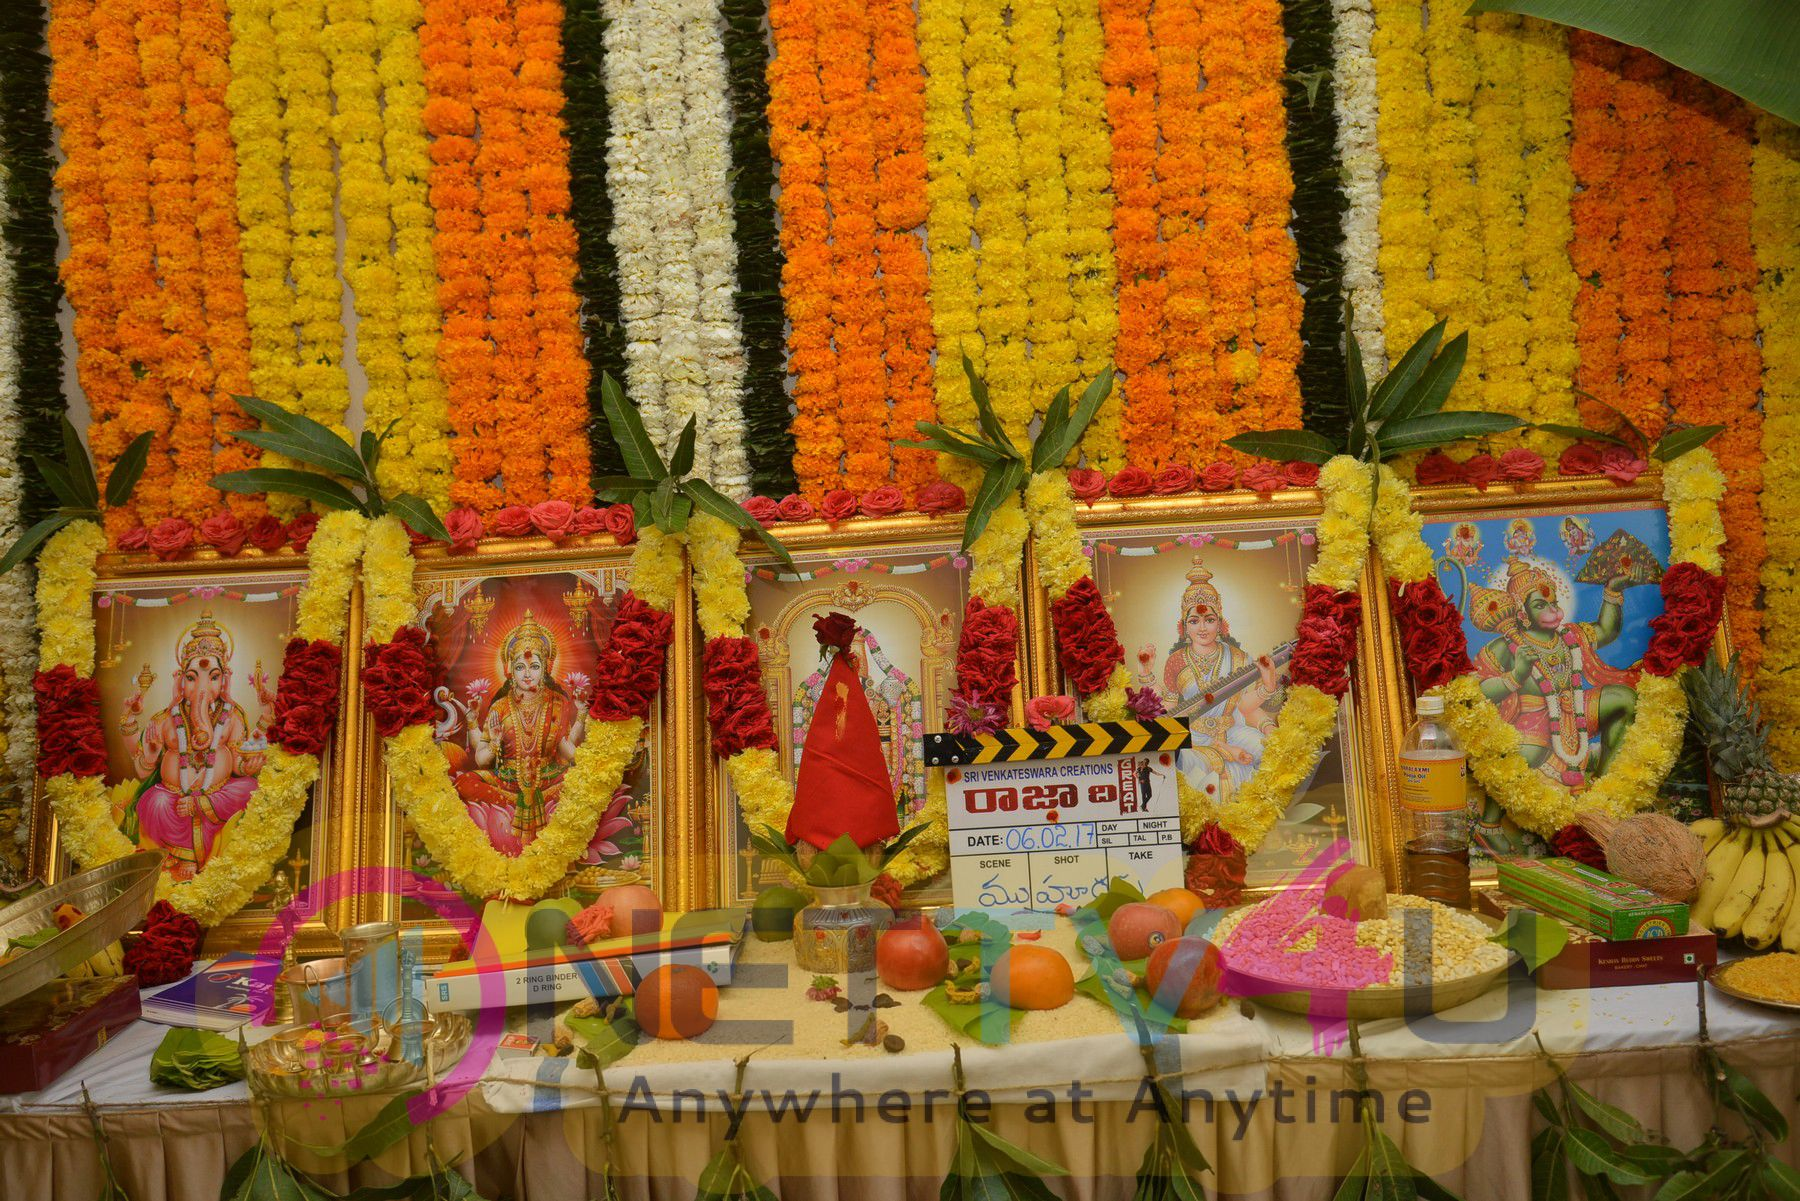 Vibrant Photos Of Ravi Teja's Raja The Great Movie Pooja Ceremony Telugu Gallery